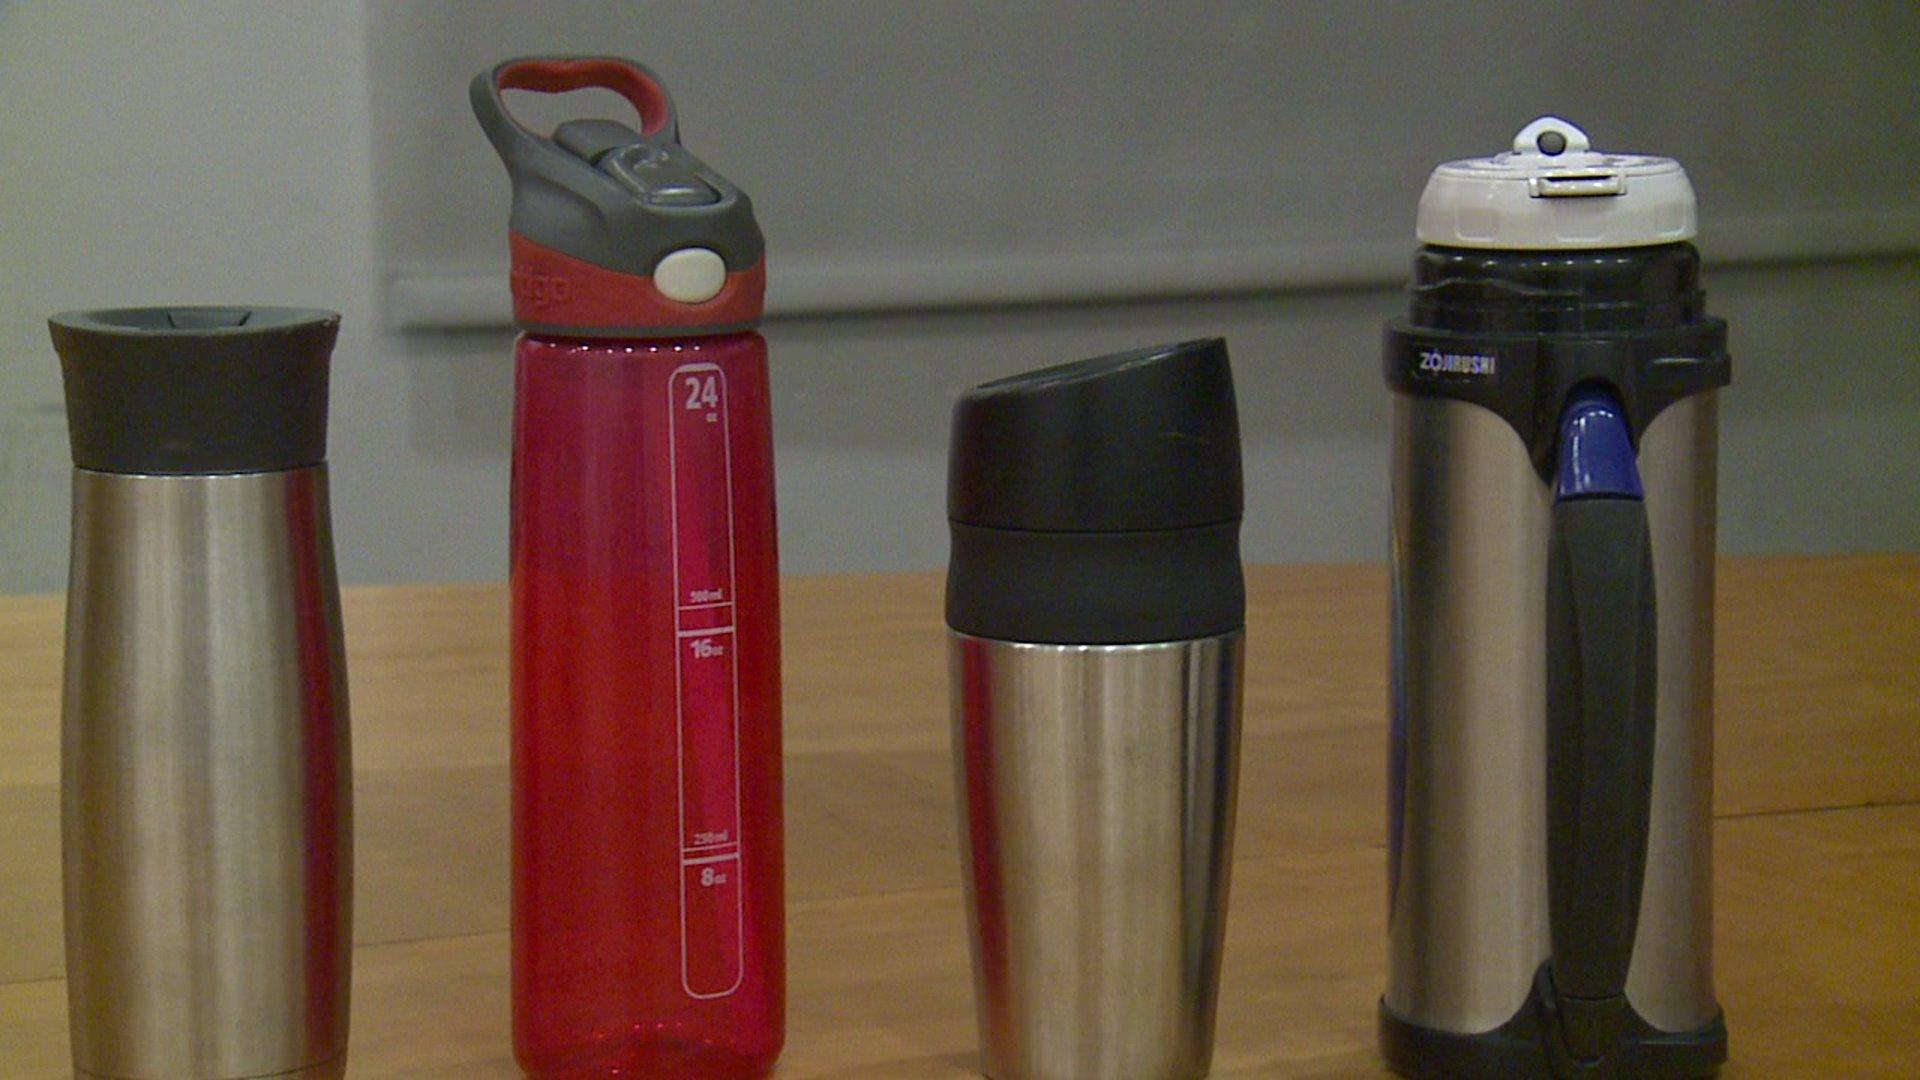 Shocking Amount of Mold Found in Travel Mugs